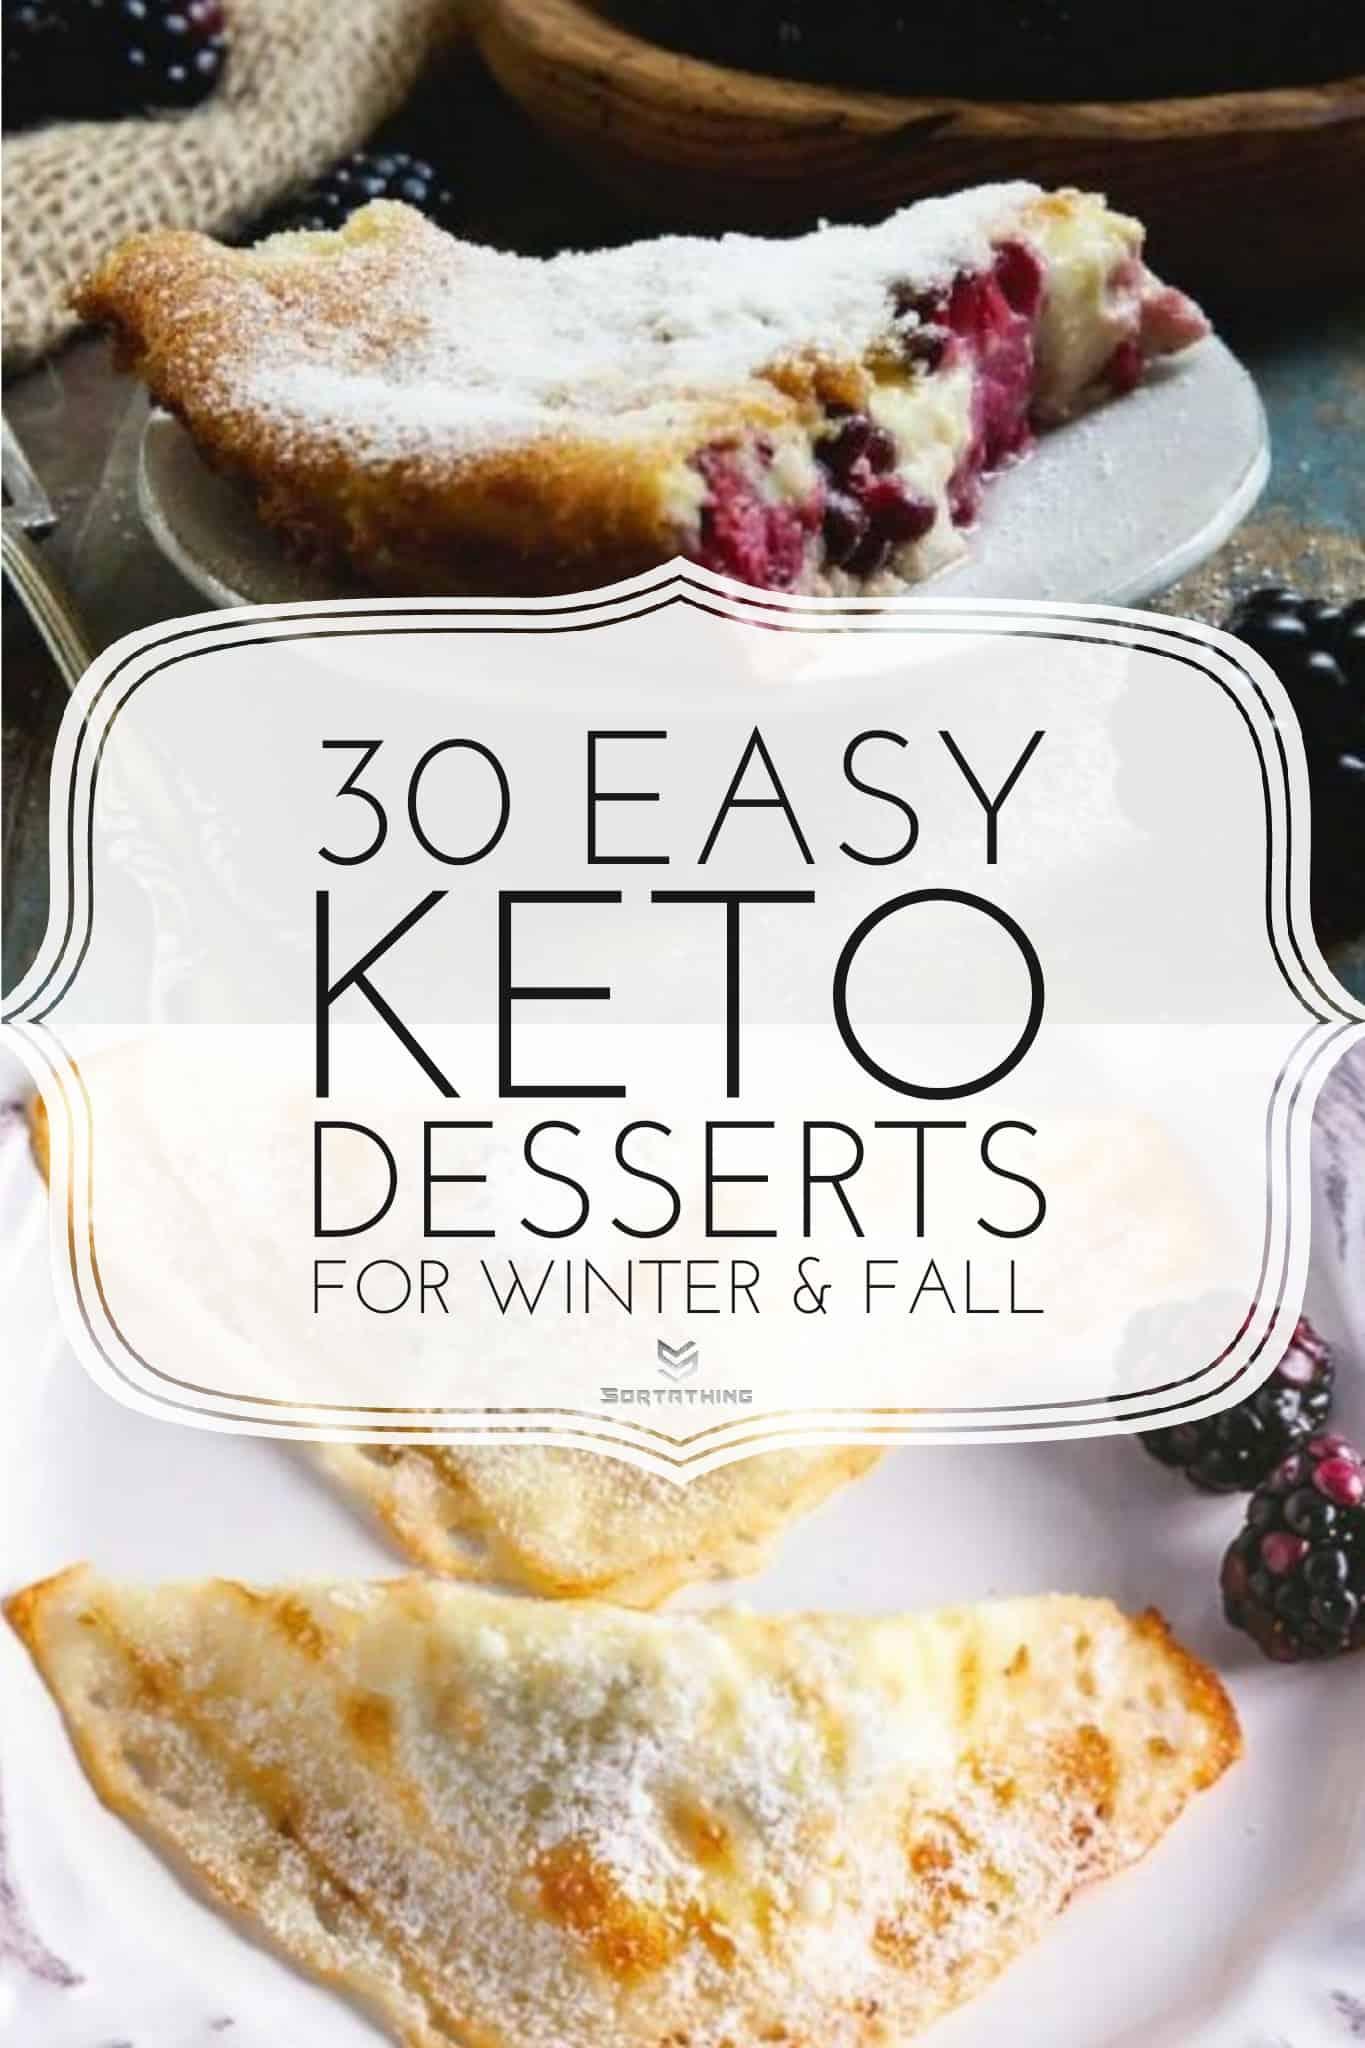 Easy Keto-Friendly Blackberry Clafoutis and Keto Blackberry Cheese Danish Turnovers